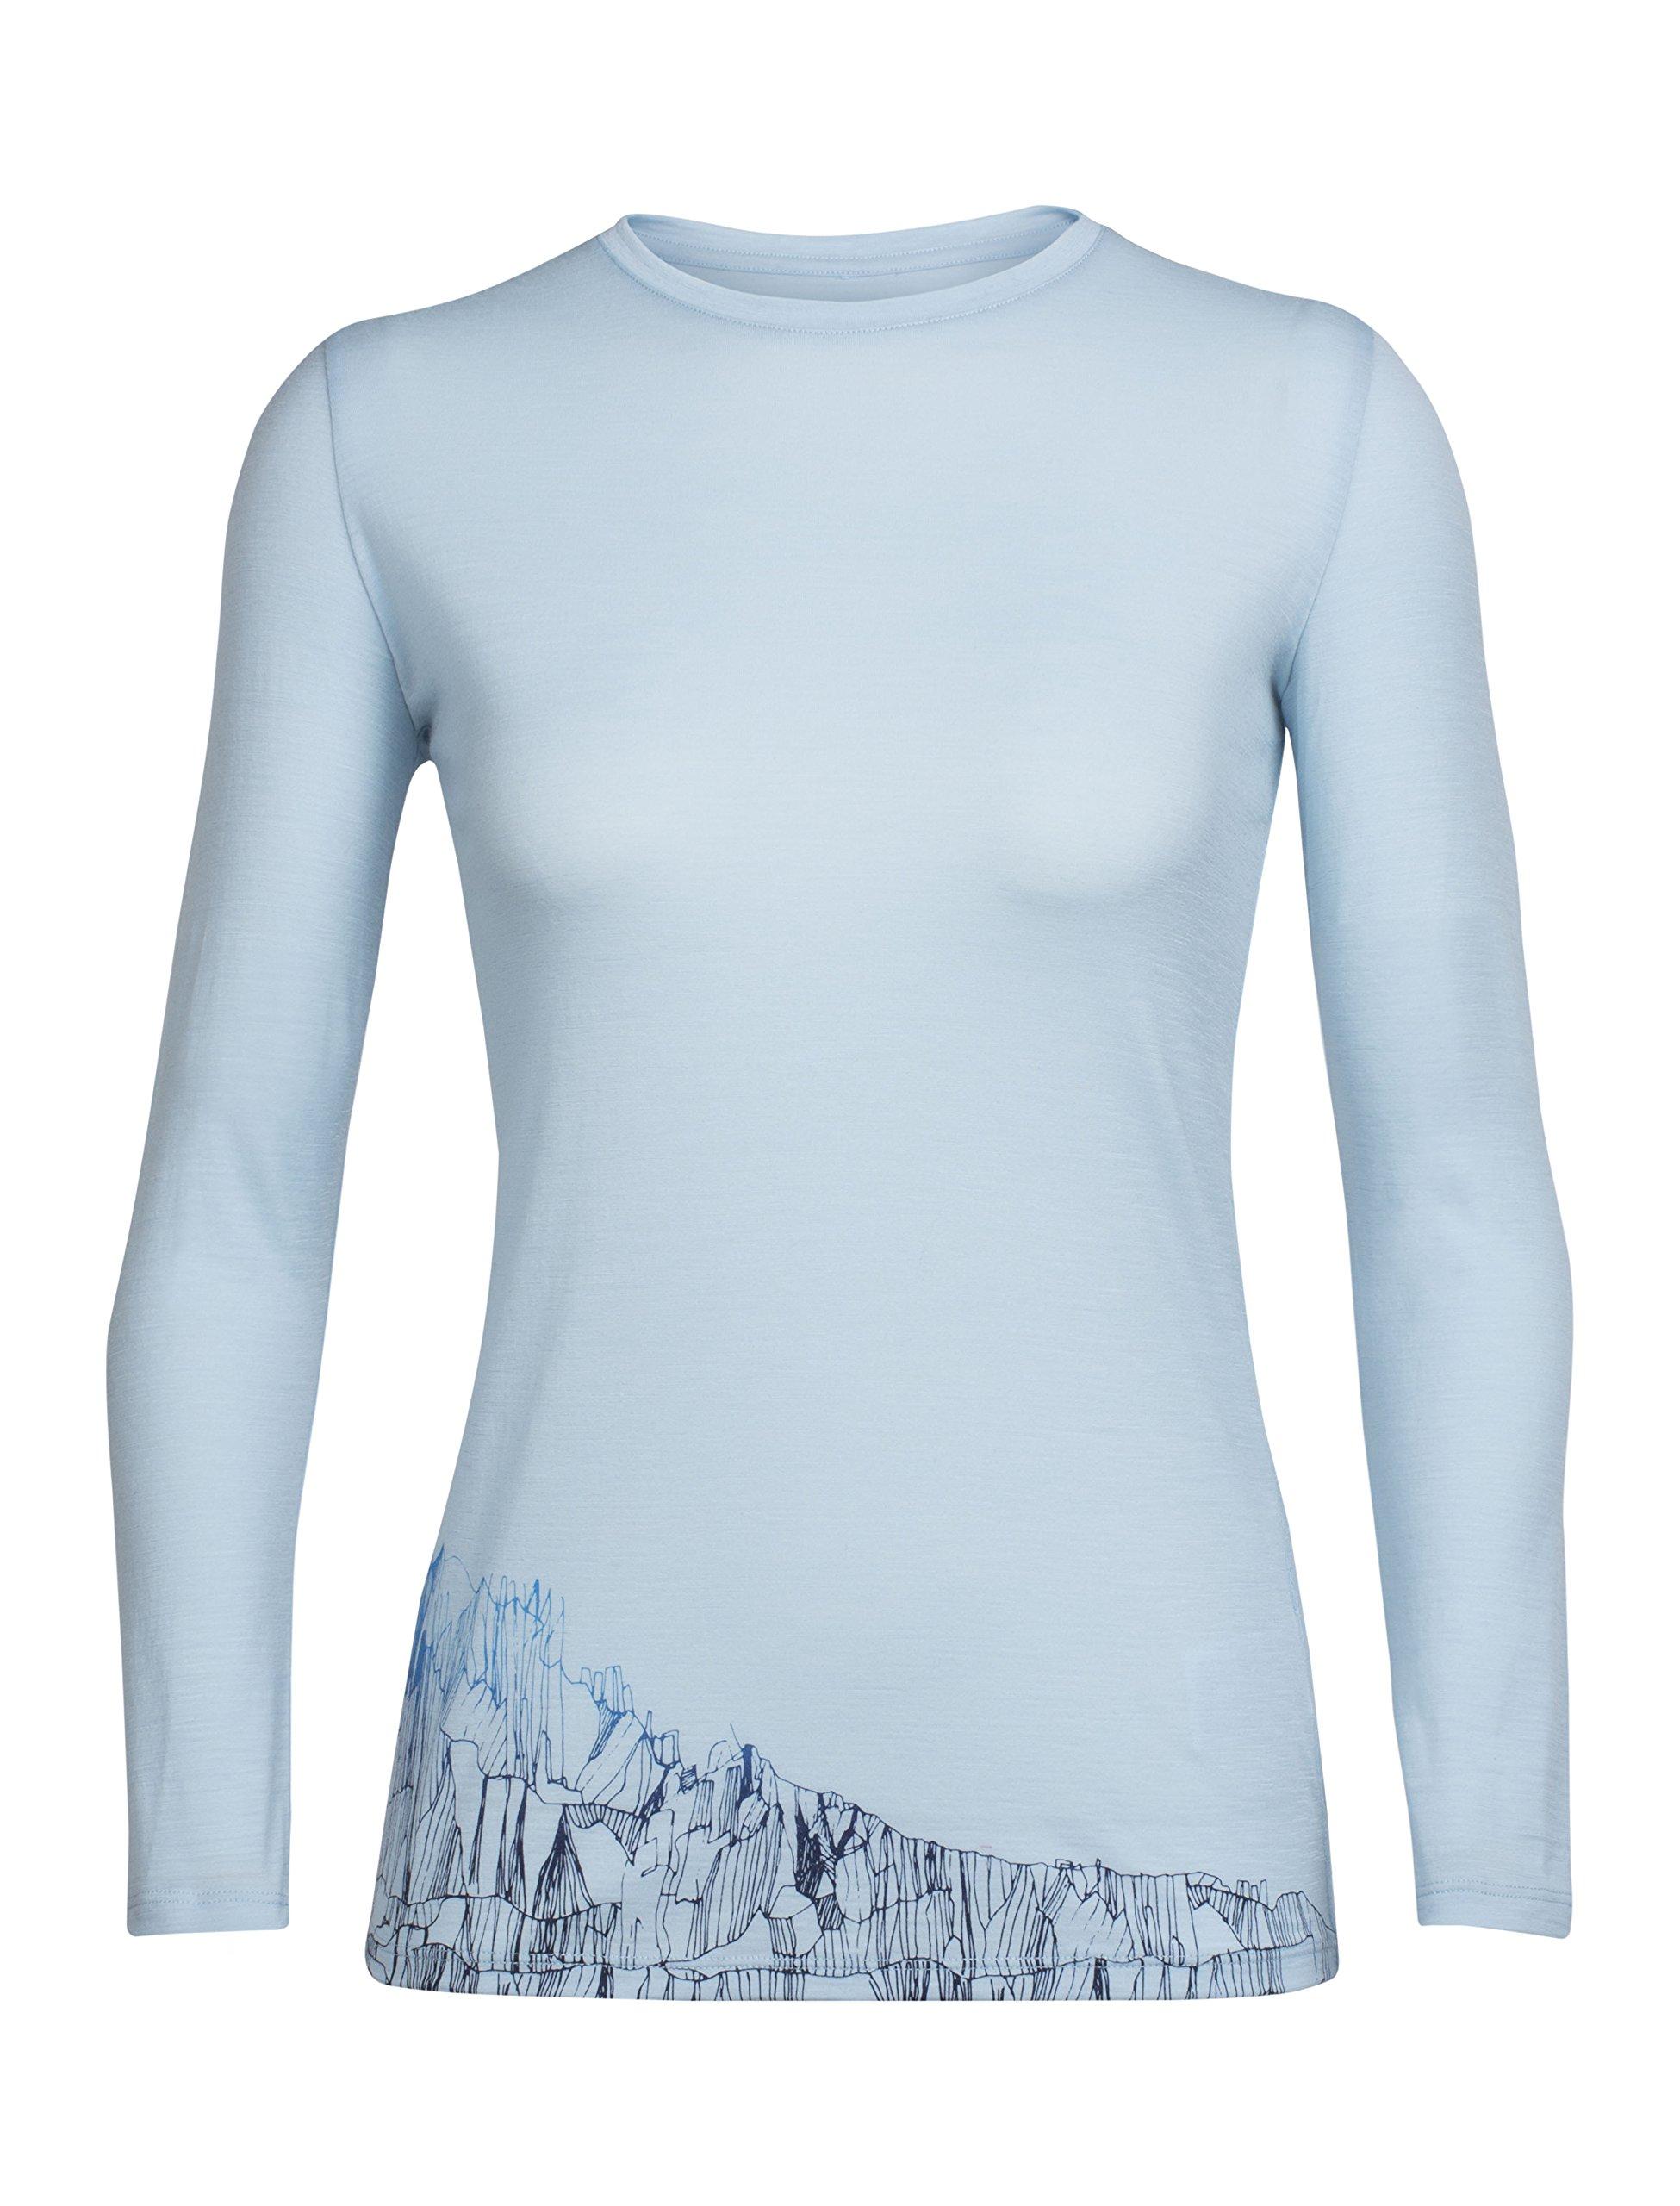 Icebreaker Merino Wmns tech lite ls crewe Alpenglow, Ice Blue, X-Large